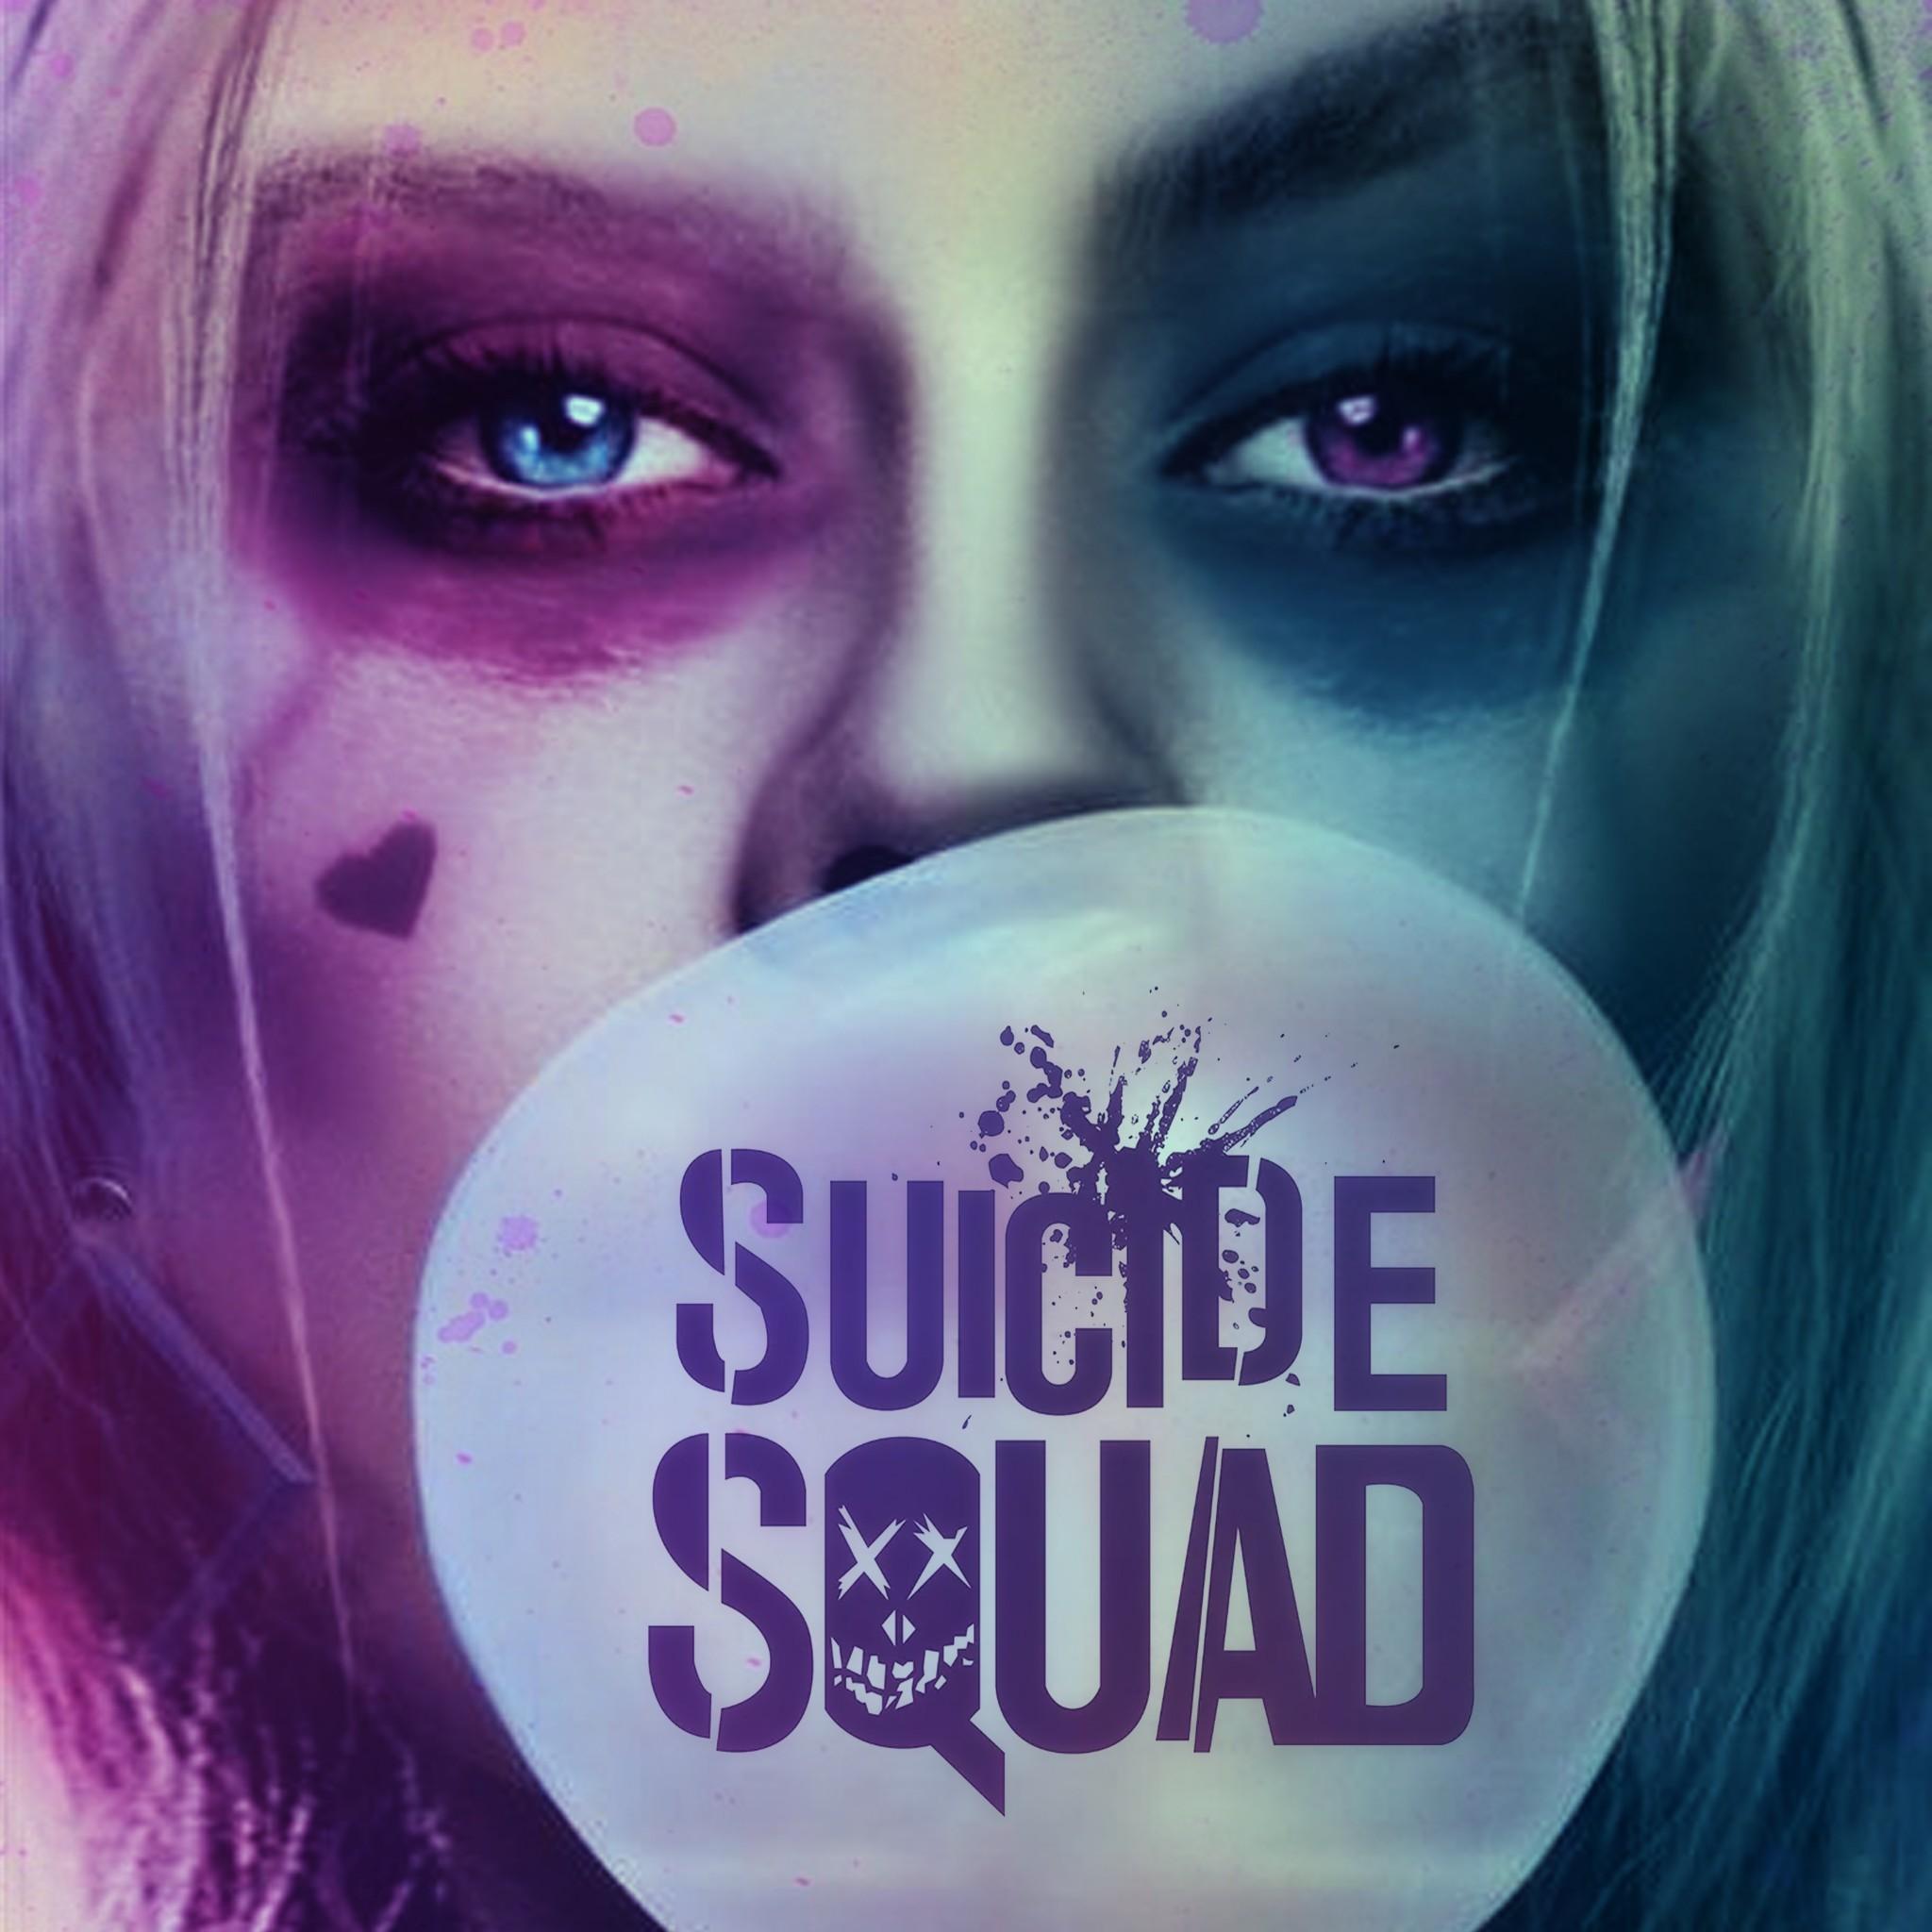 Download Suicide Squad 2048 x 2048 Wallpapers – 4660031 – FICTION VILLAIN  SUPERHERO SUICIDE SQUAD HARLEY QUINN JOKER | mobile9